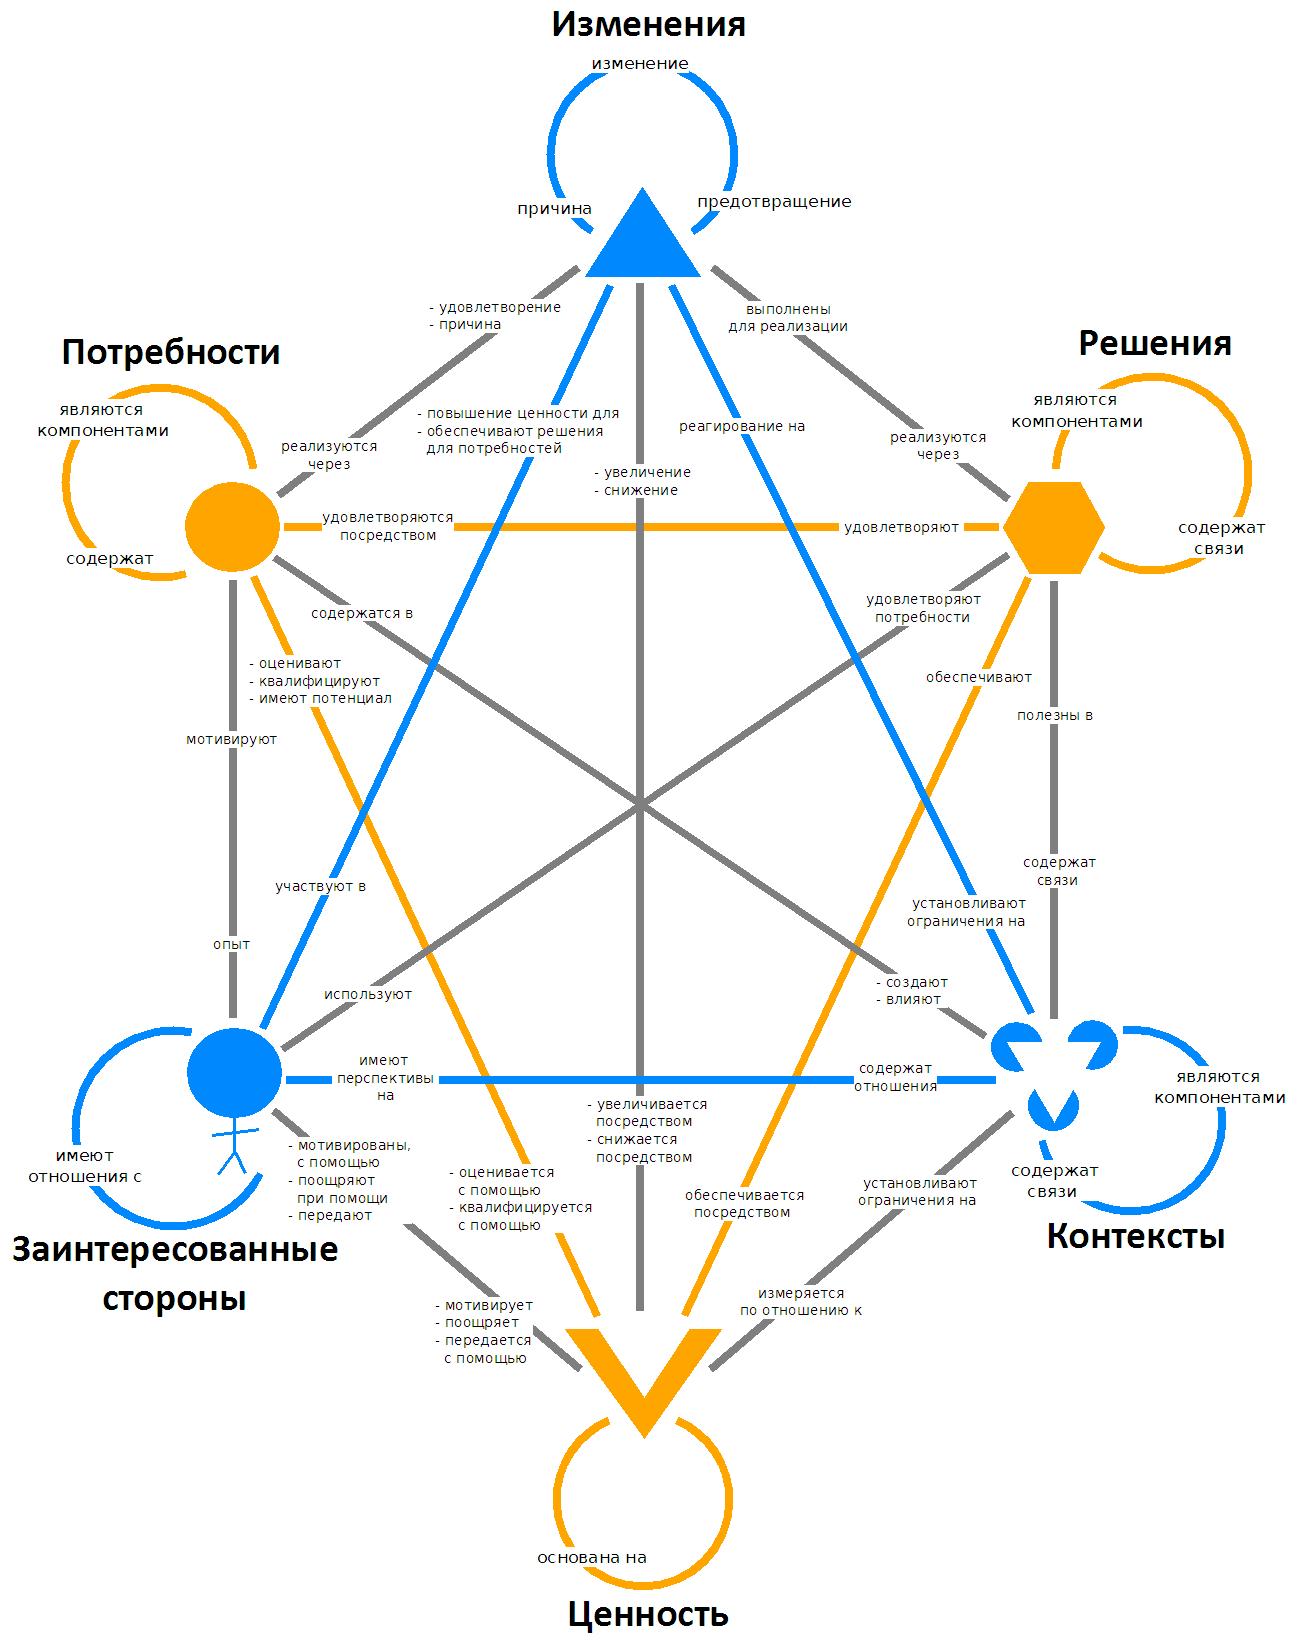 Концептуальная модель бизнес-анализа